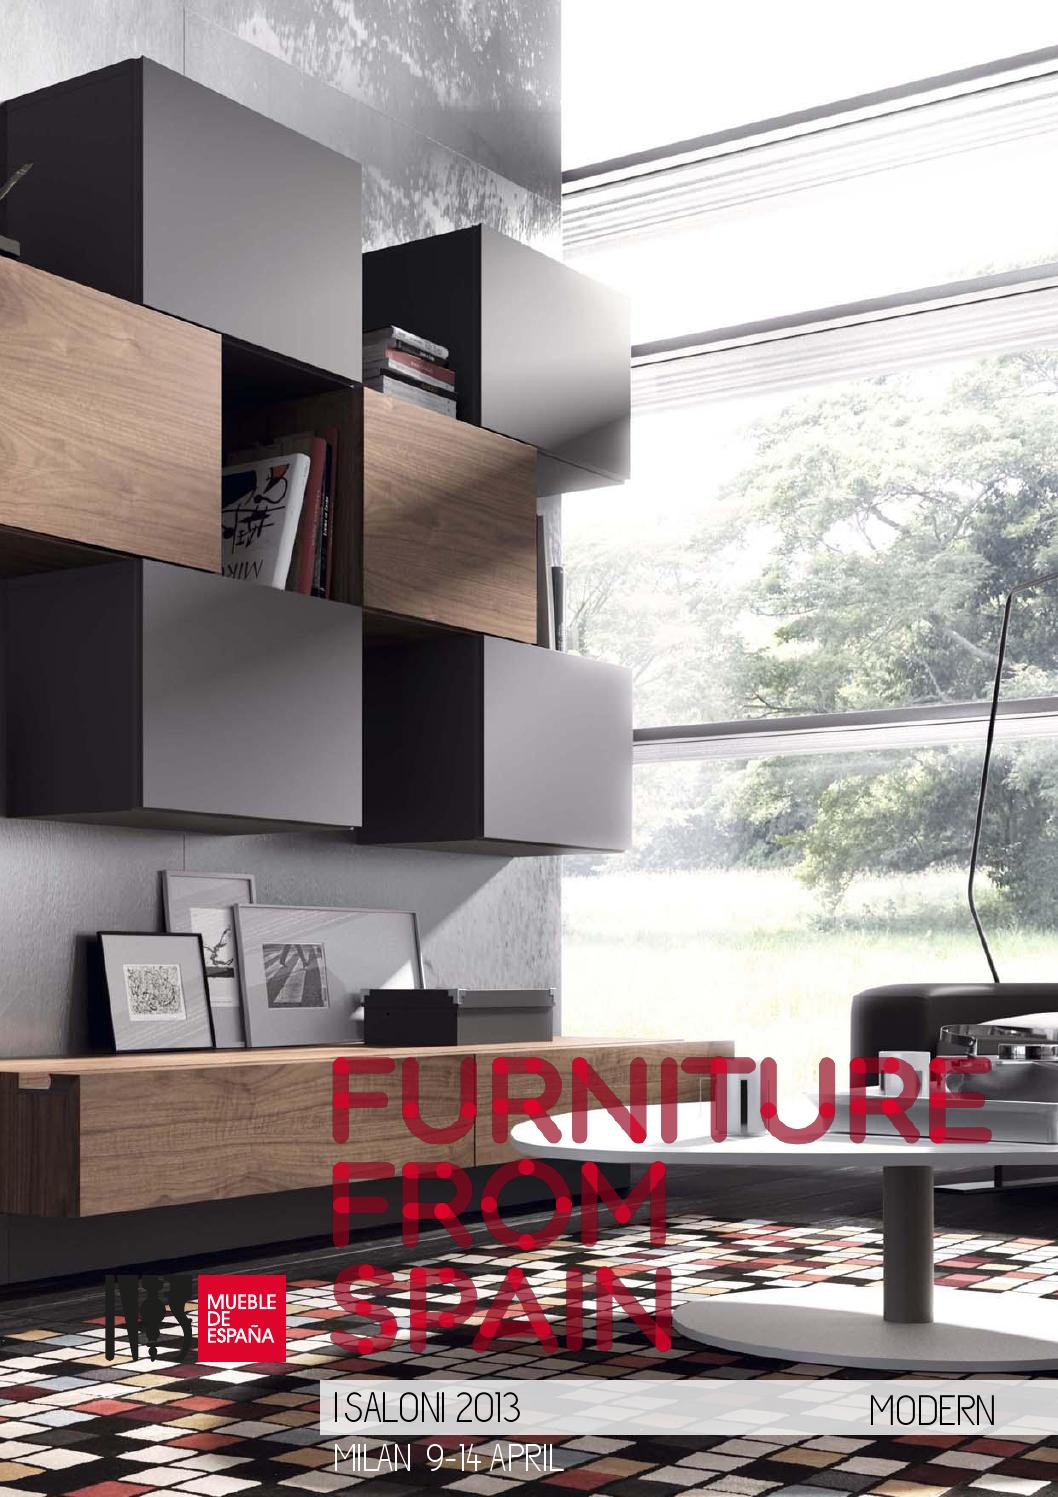 Modern Spanish Furniture At I Saloni 2013 By Furniture From Spain  # Muebles Piferrer La Garriga